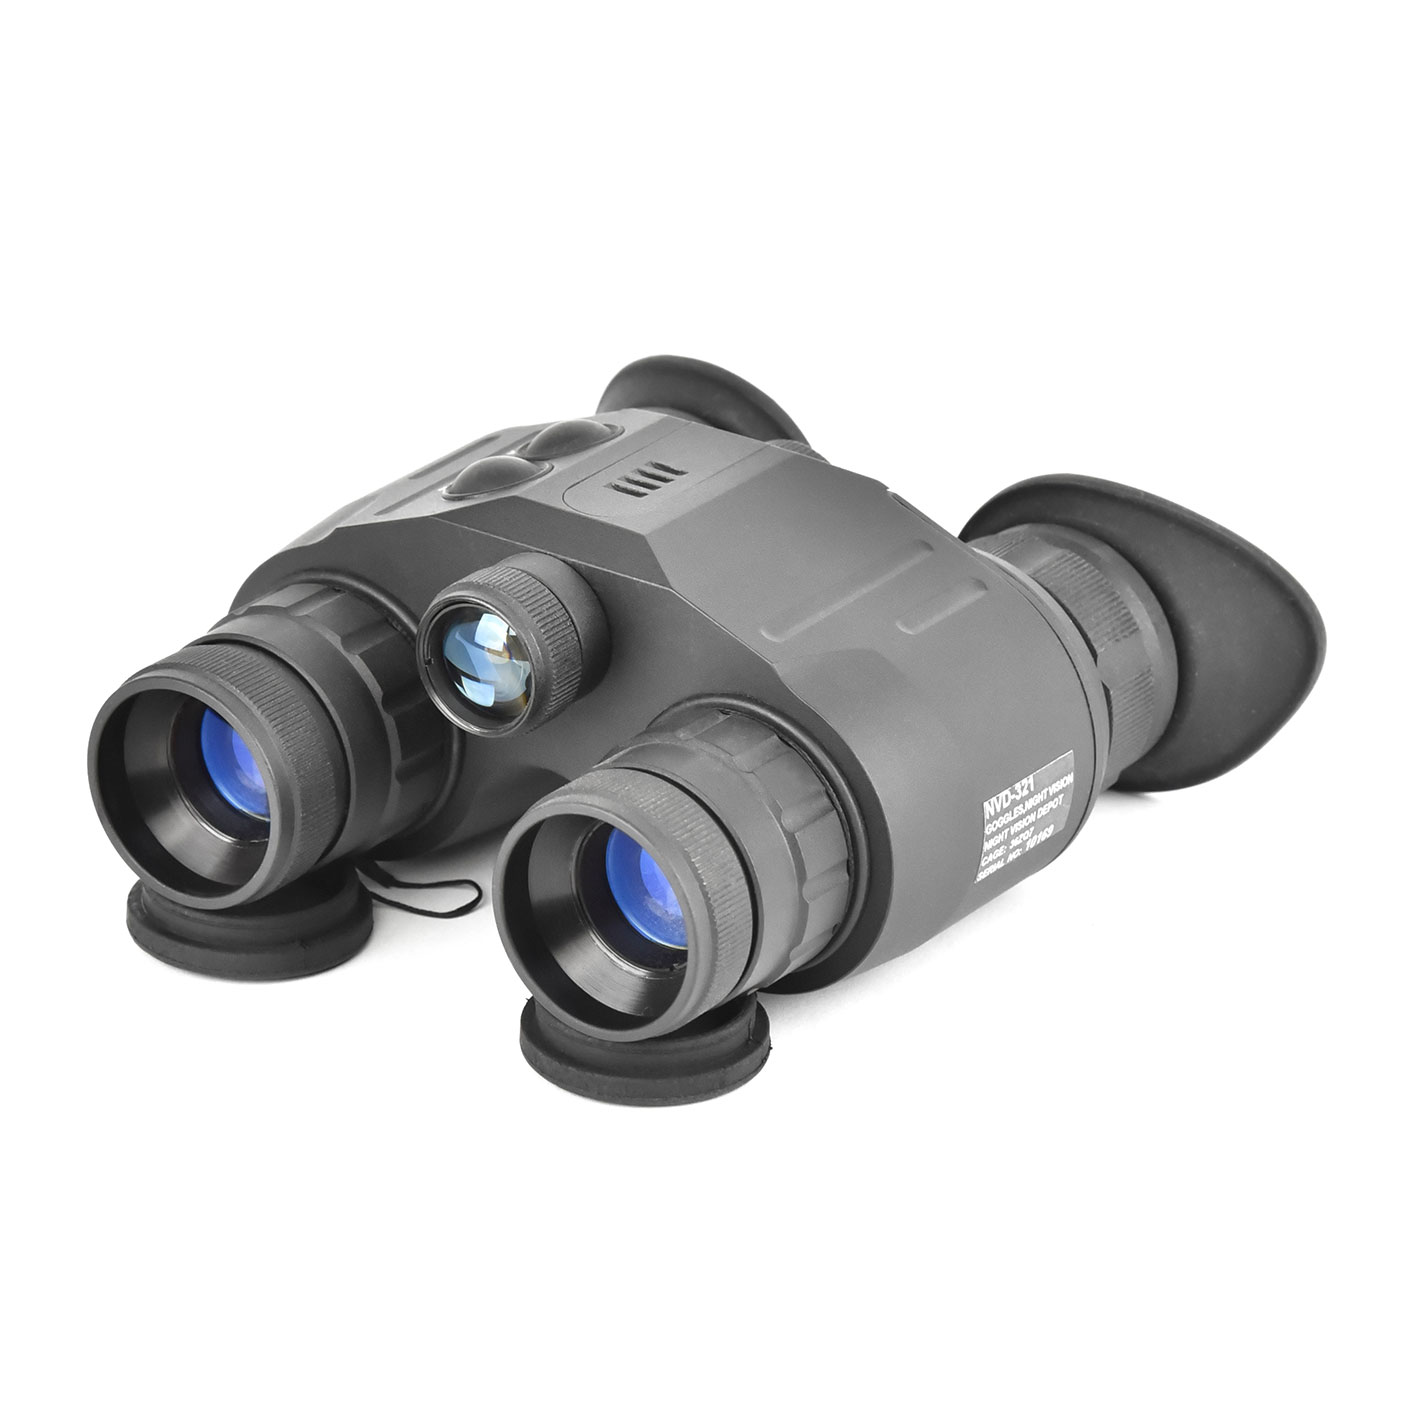 NVD-321 Night Vision Binocular